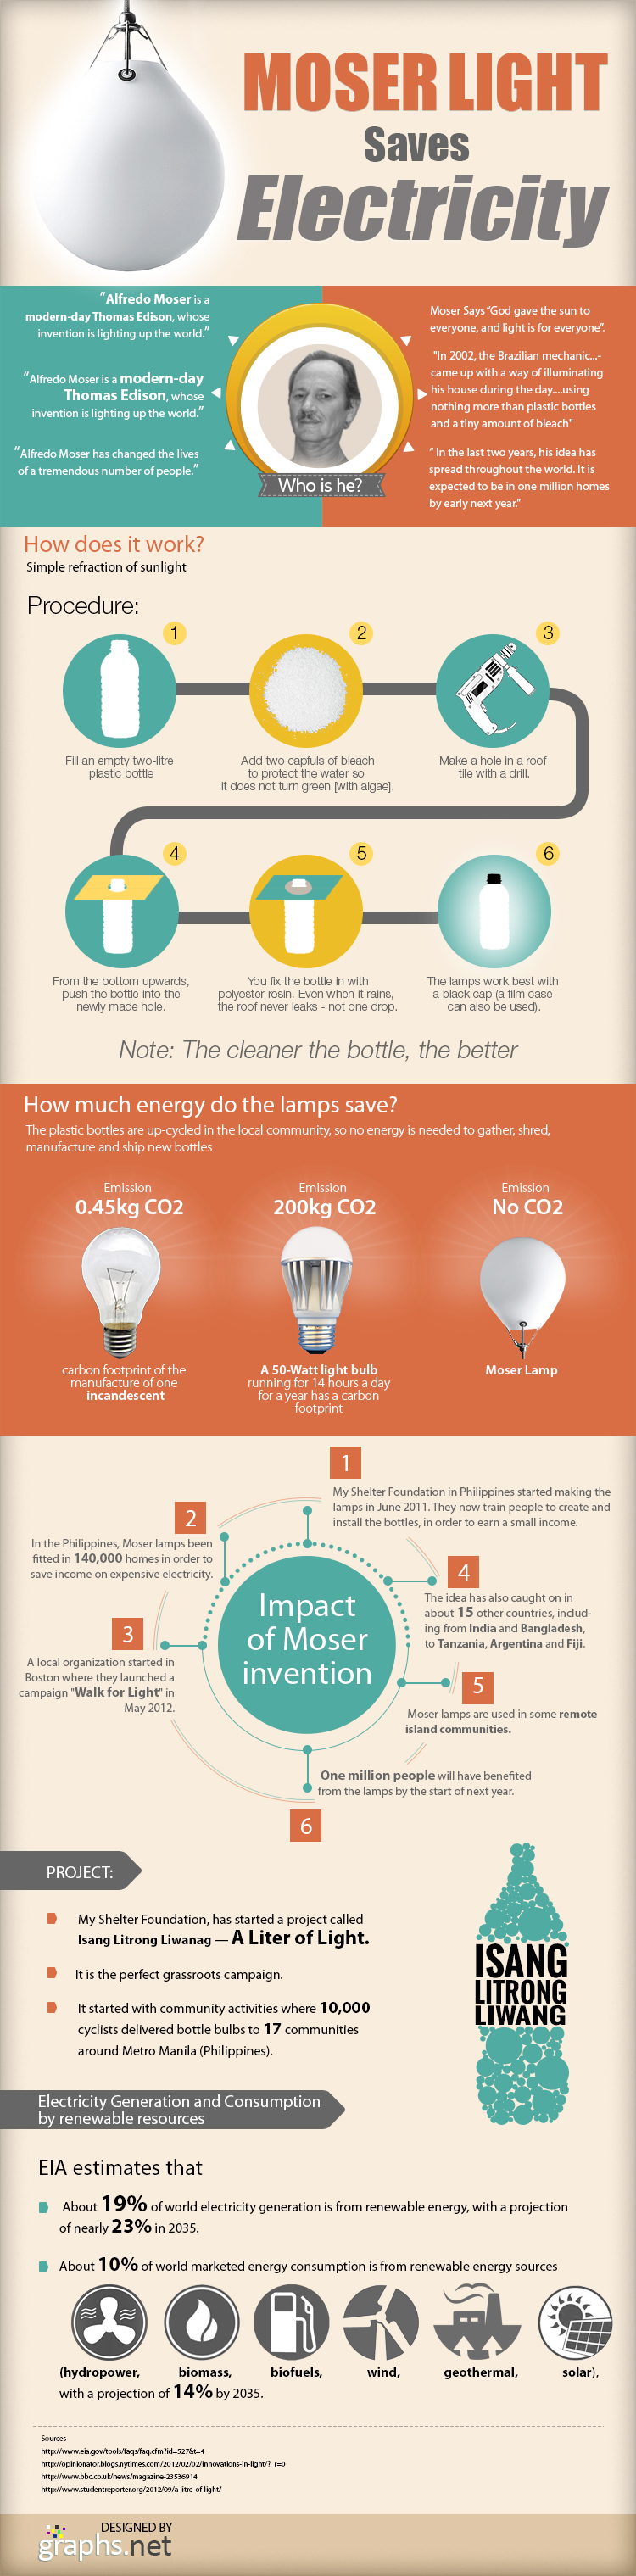 Moser light saves Electricity D